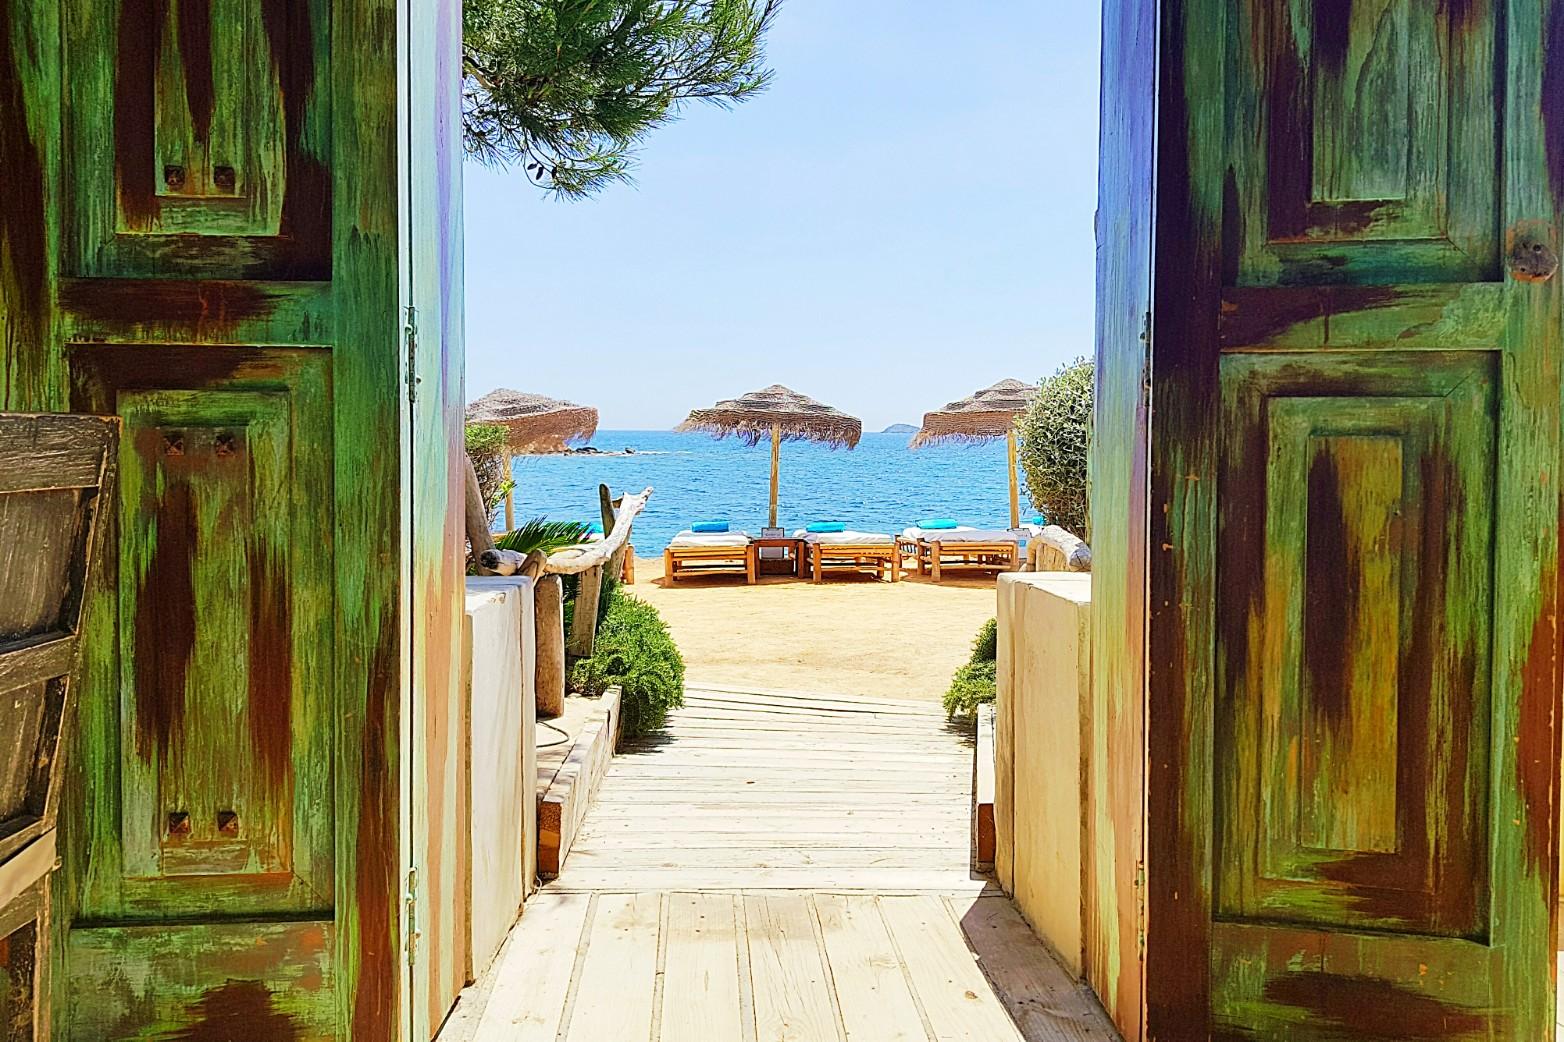 ©CatMilton Babylon Ibiza 2018 Event View 01 1564x1042.jpg